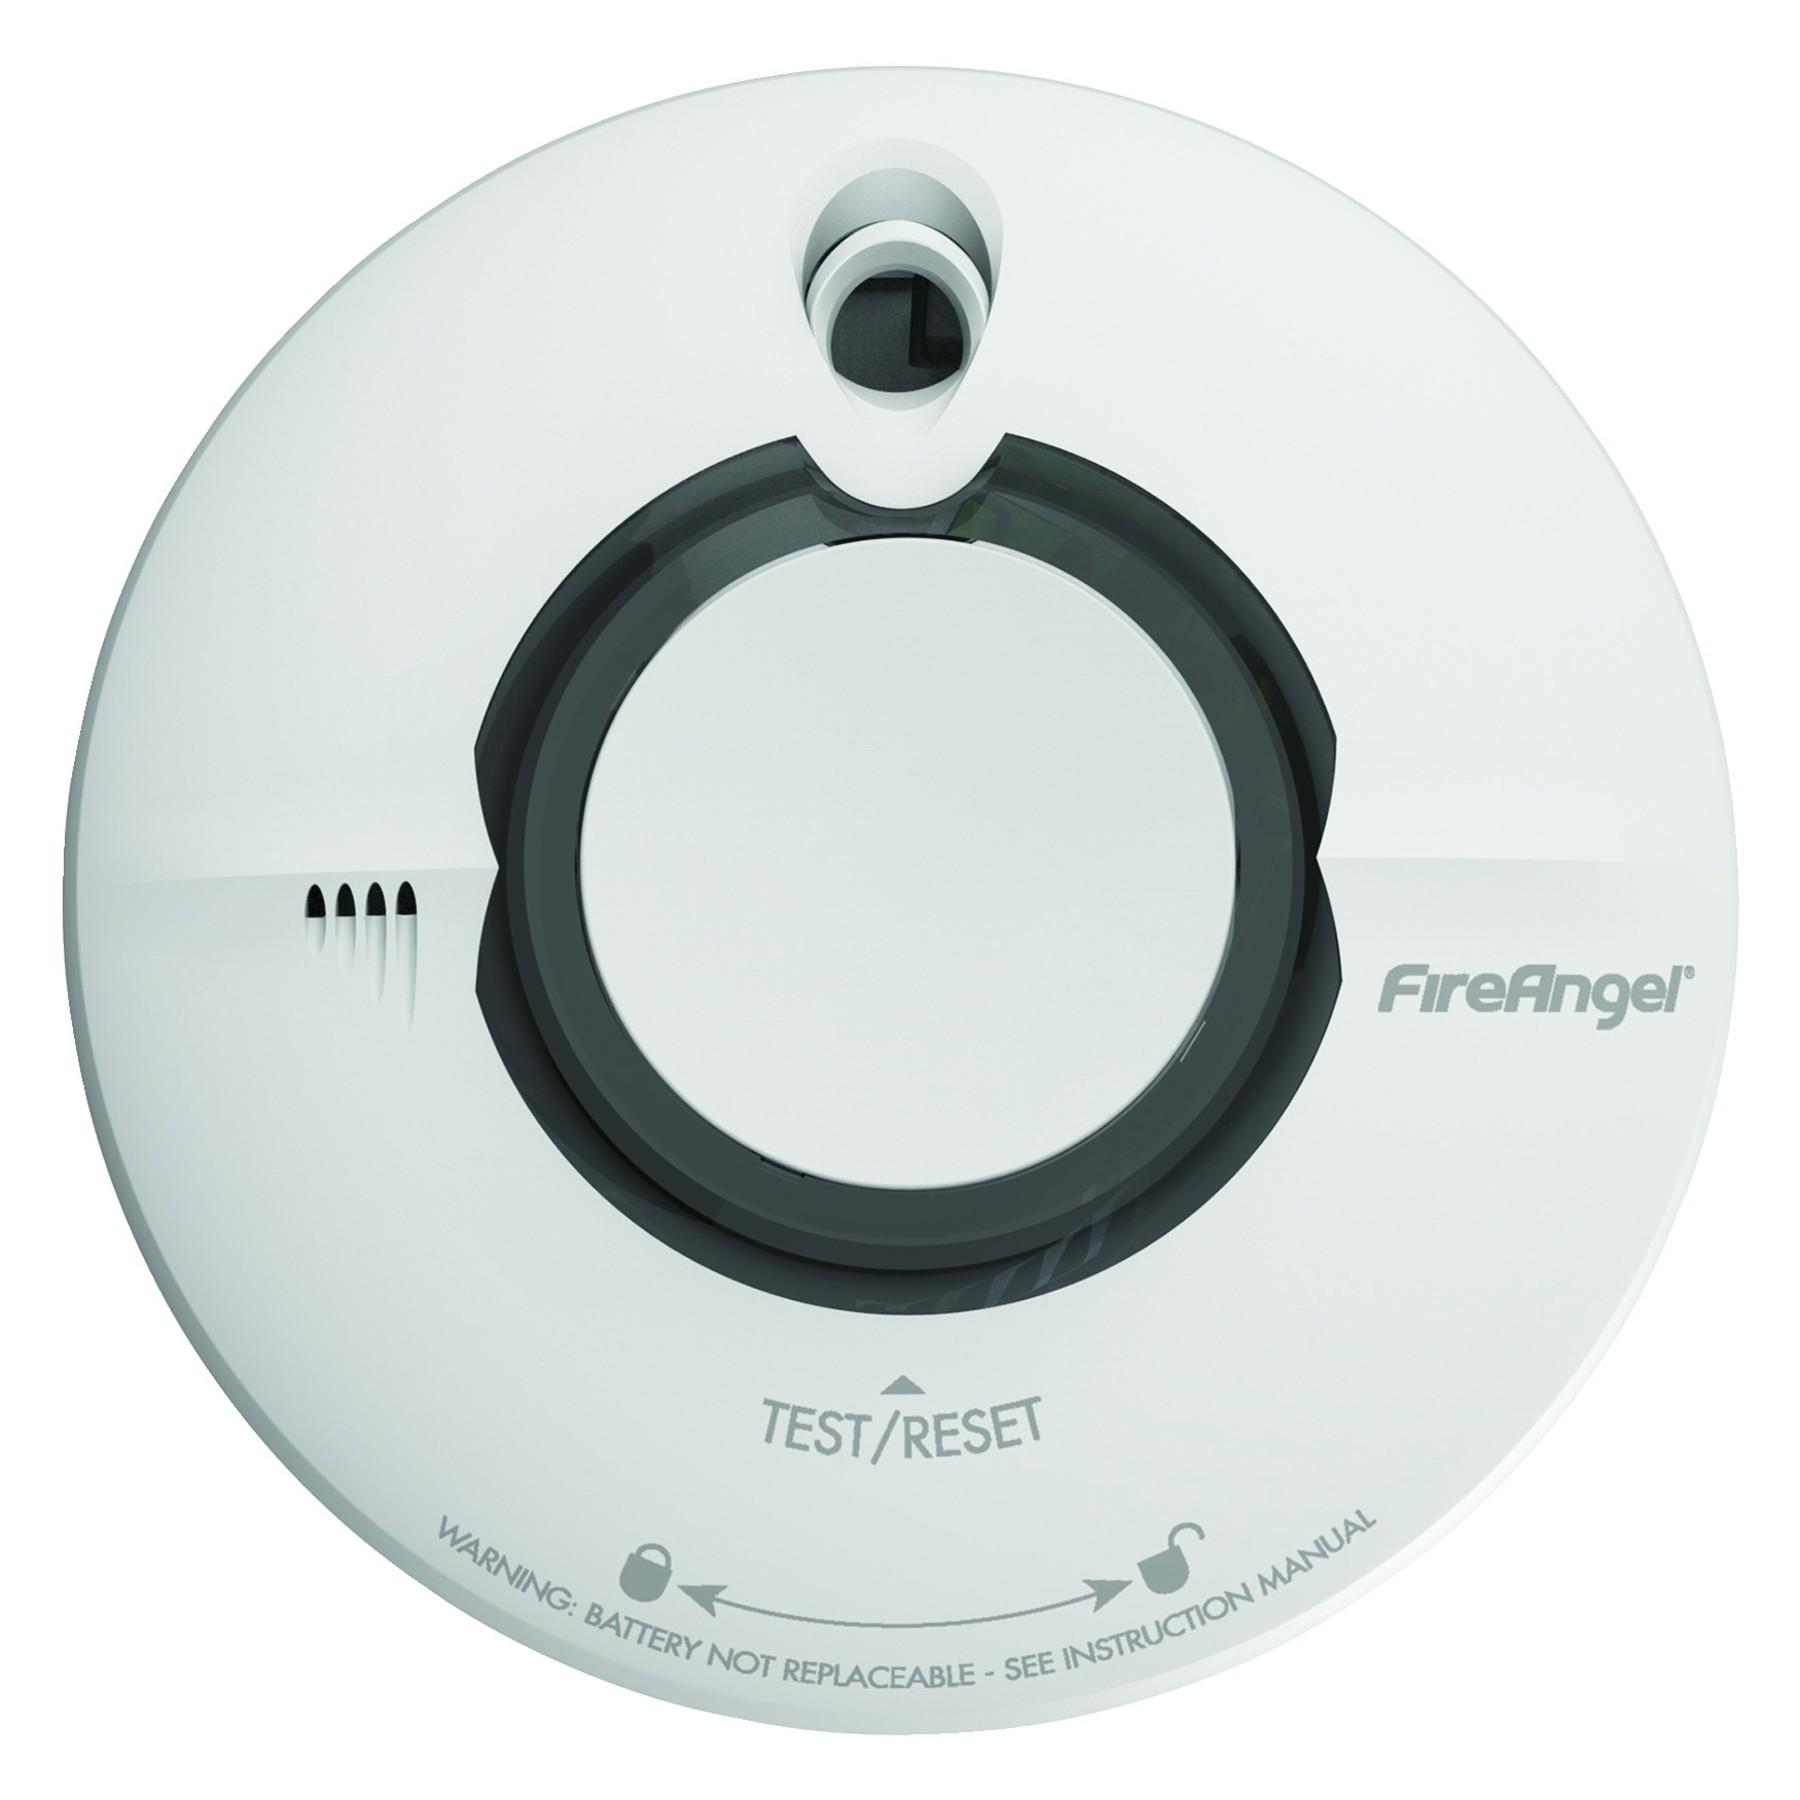 fireangel wst 630 wireless interlink smoke alarm 10 year life ebay. Black Bedroom Furniture Sets. Home Design Ideas